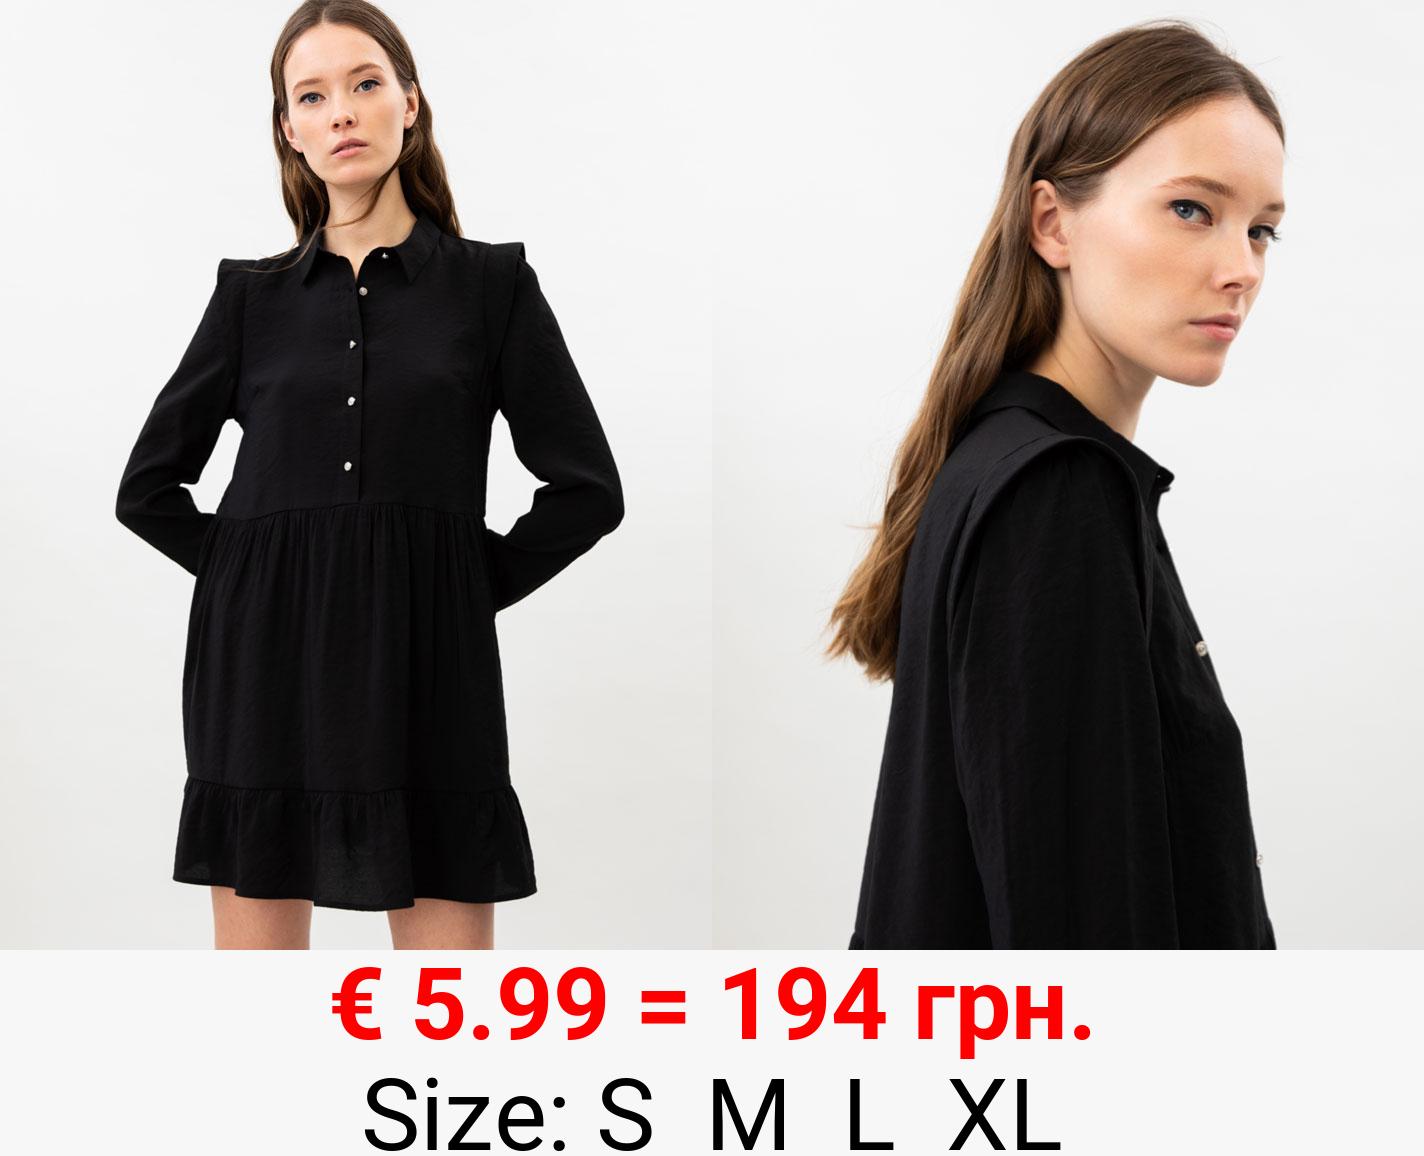 Shirt dress with shoulder detail